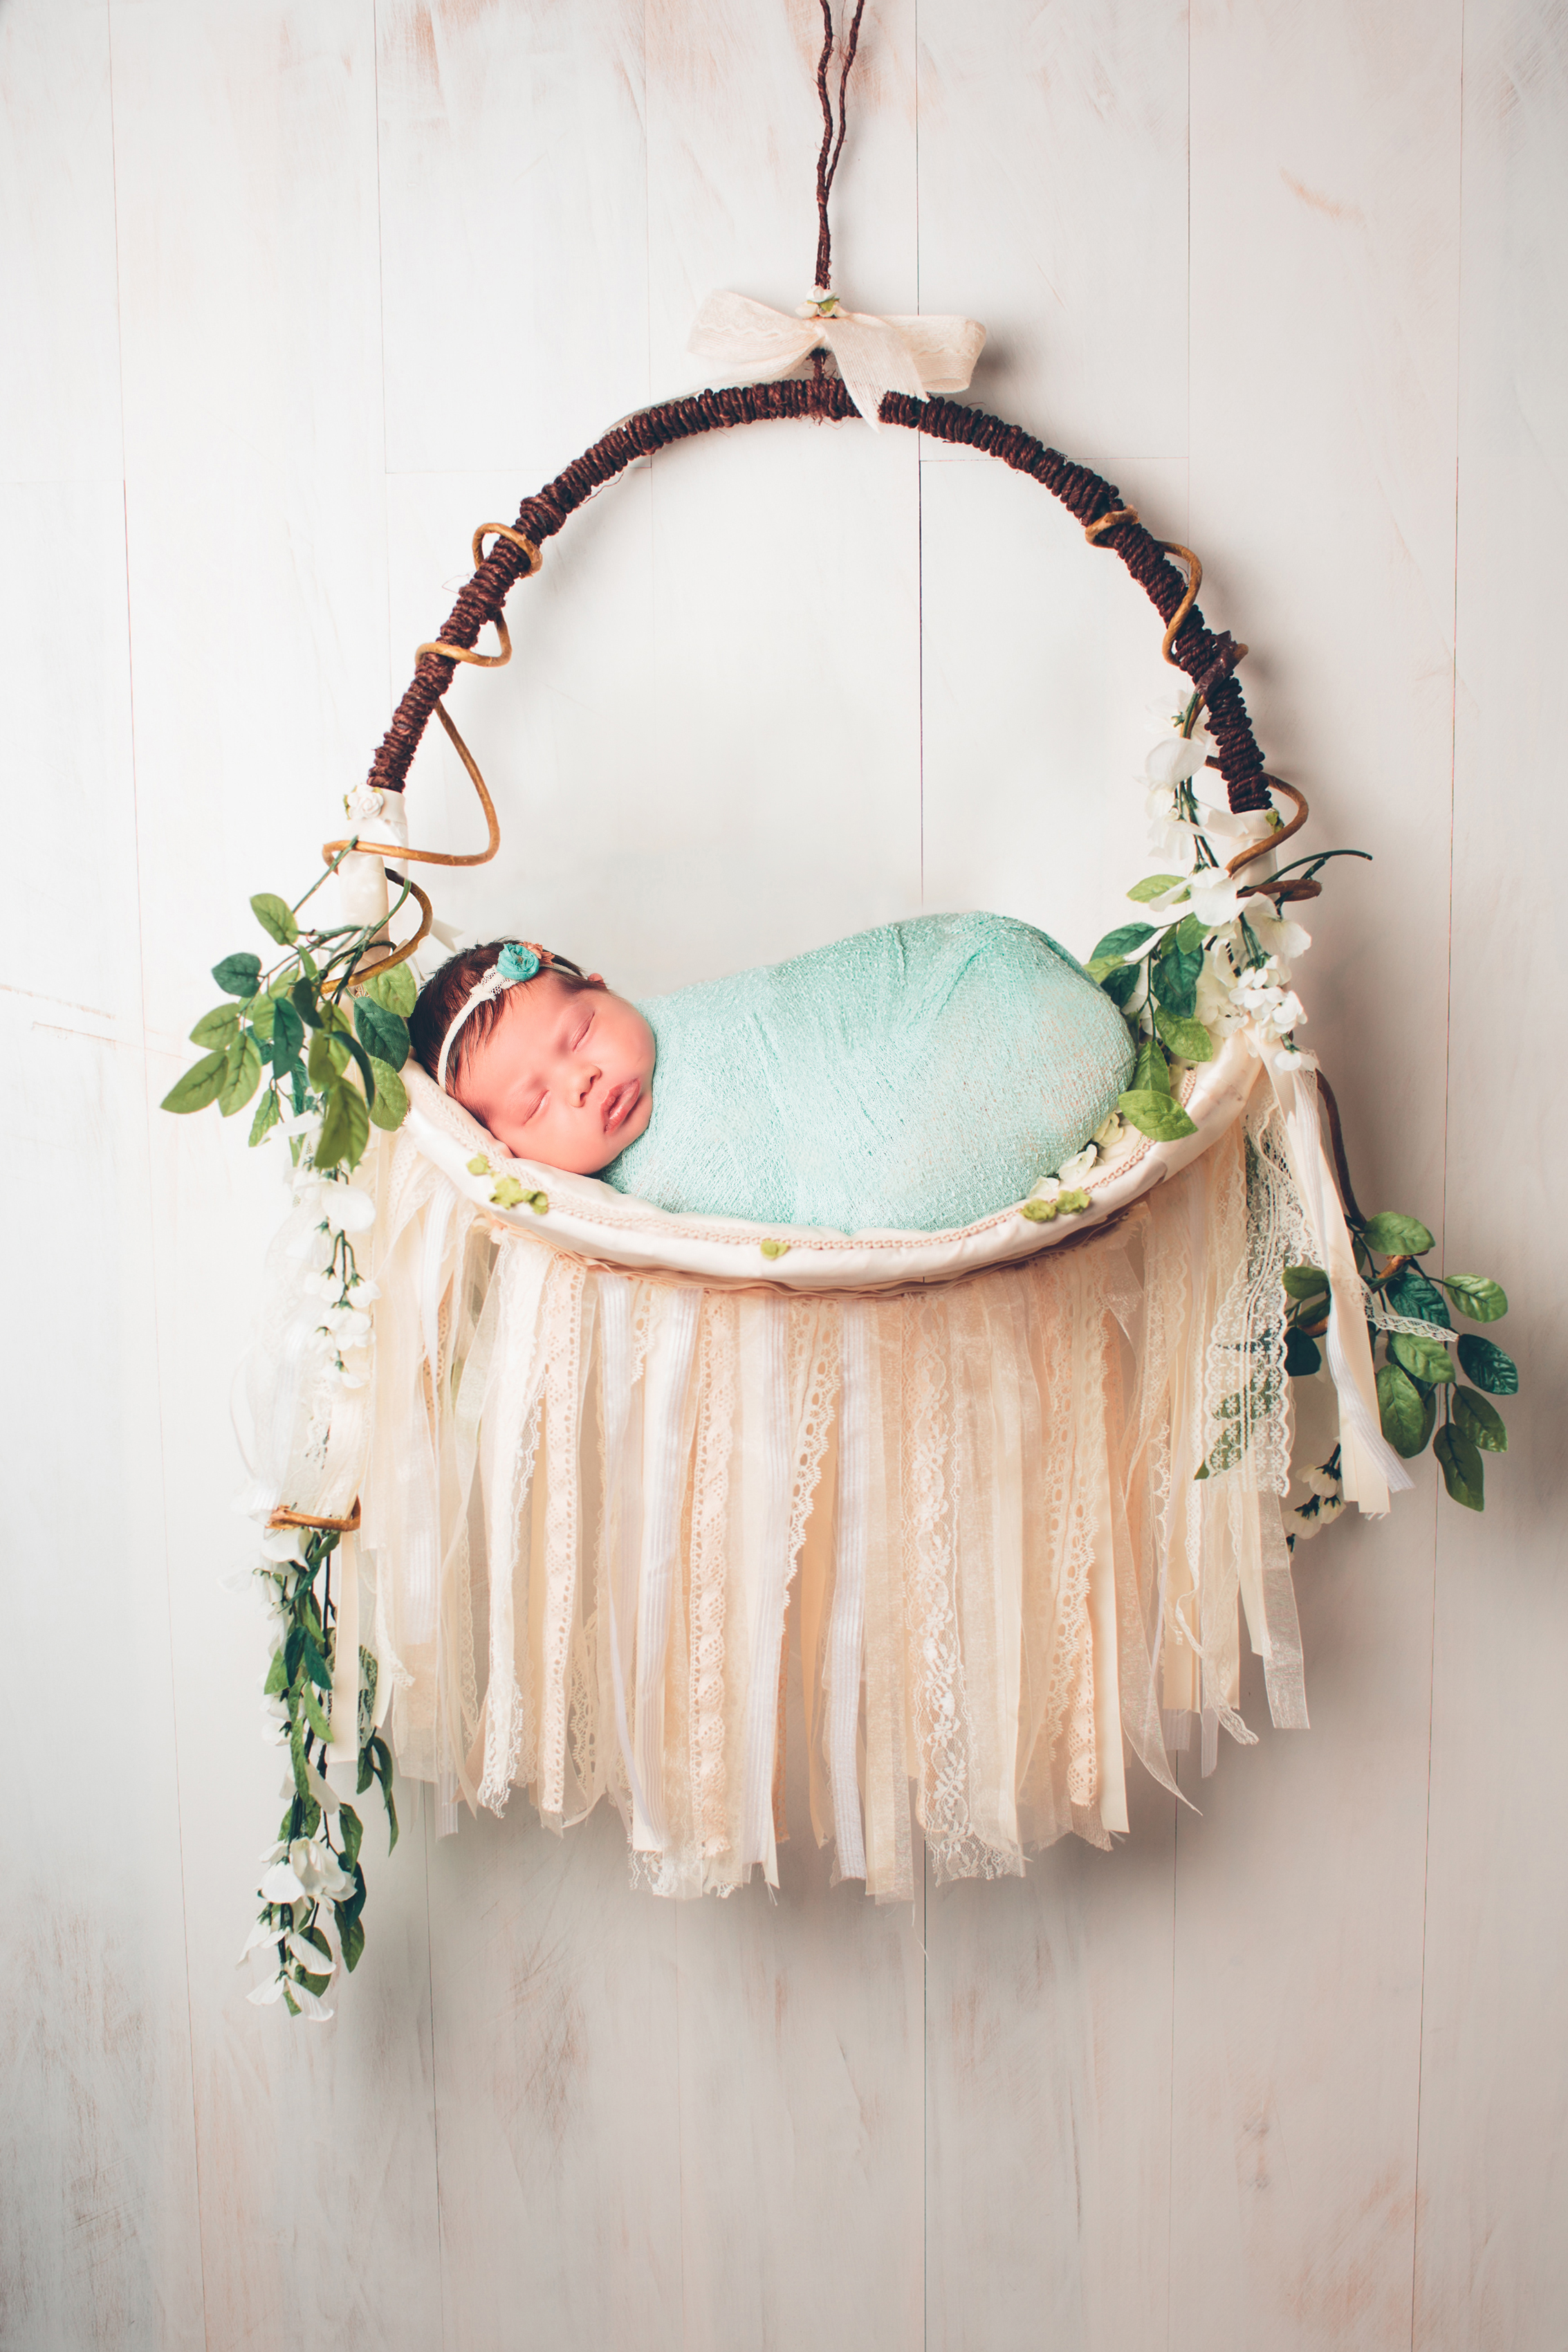 Sydney + Brit Newborn Photo Session-8.jpg